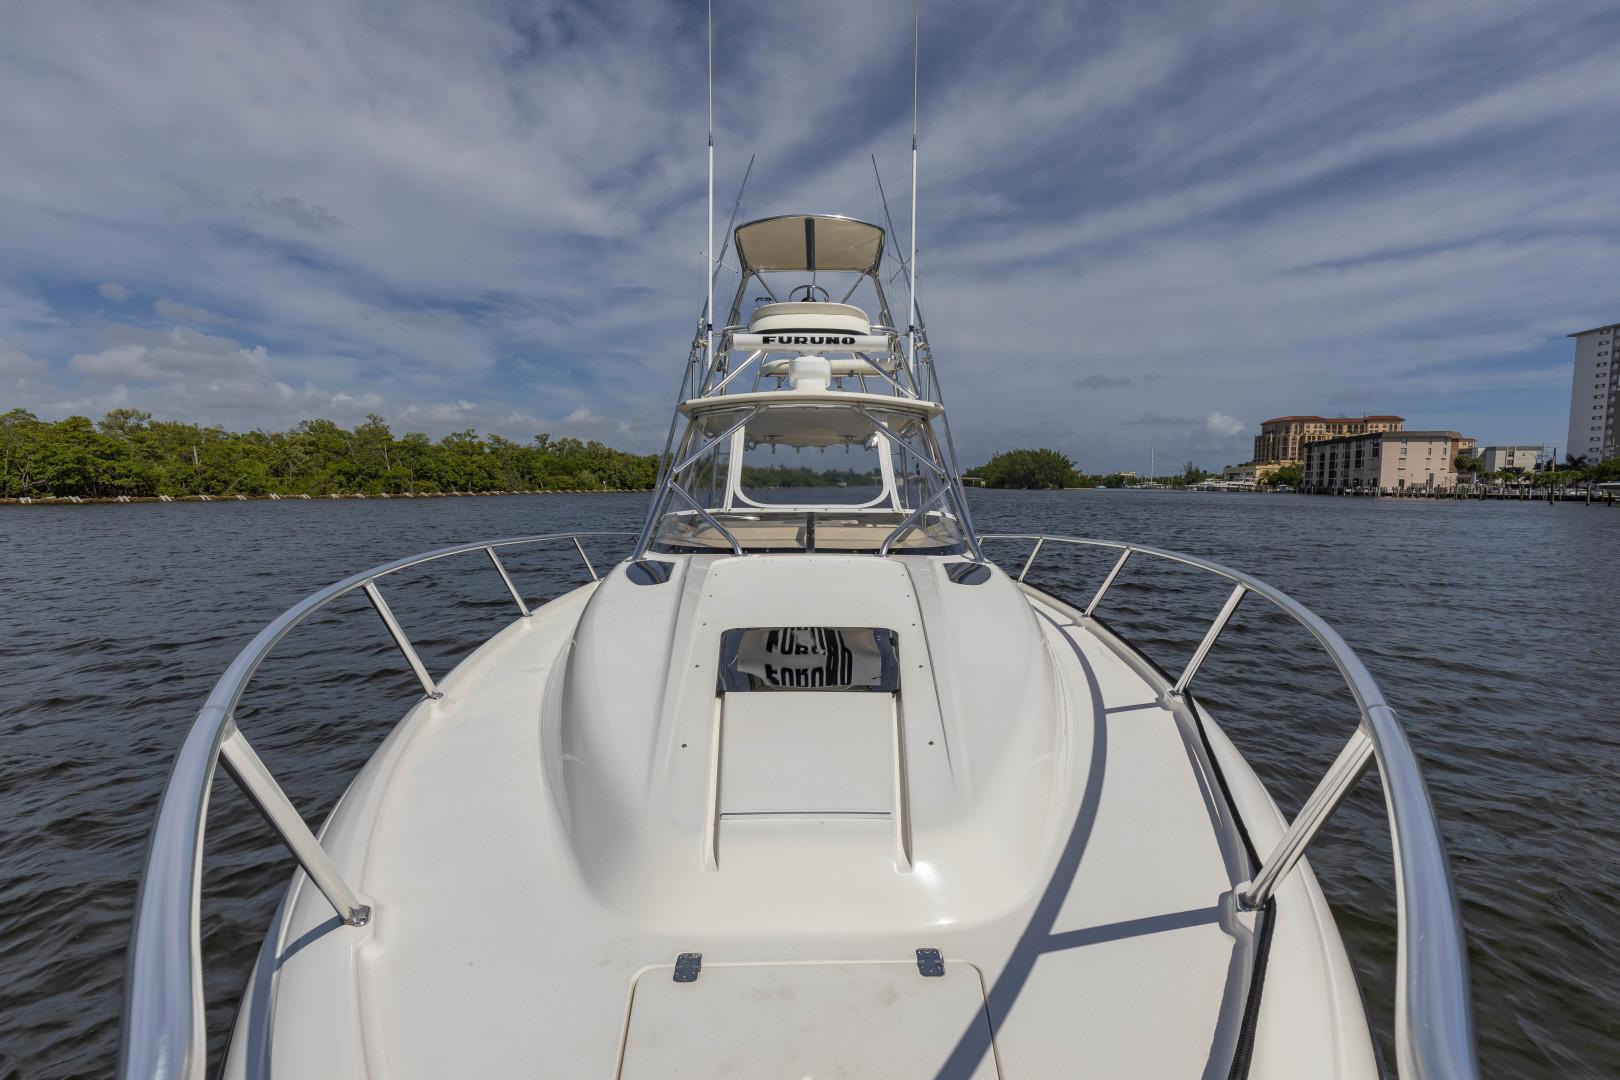 Intrepid-377 Walkaround 2005-Rock Boat REFIT 2018 Dania Beach-Florida-United States-377 Intrepid Bow 4-1511538 | Thumbnail